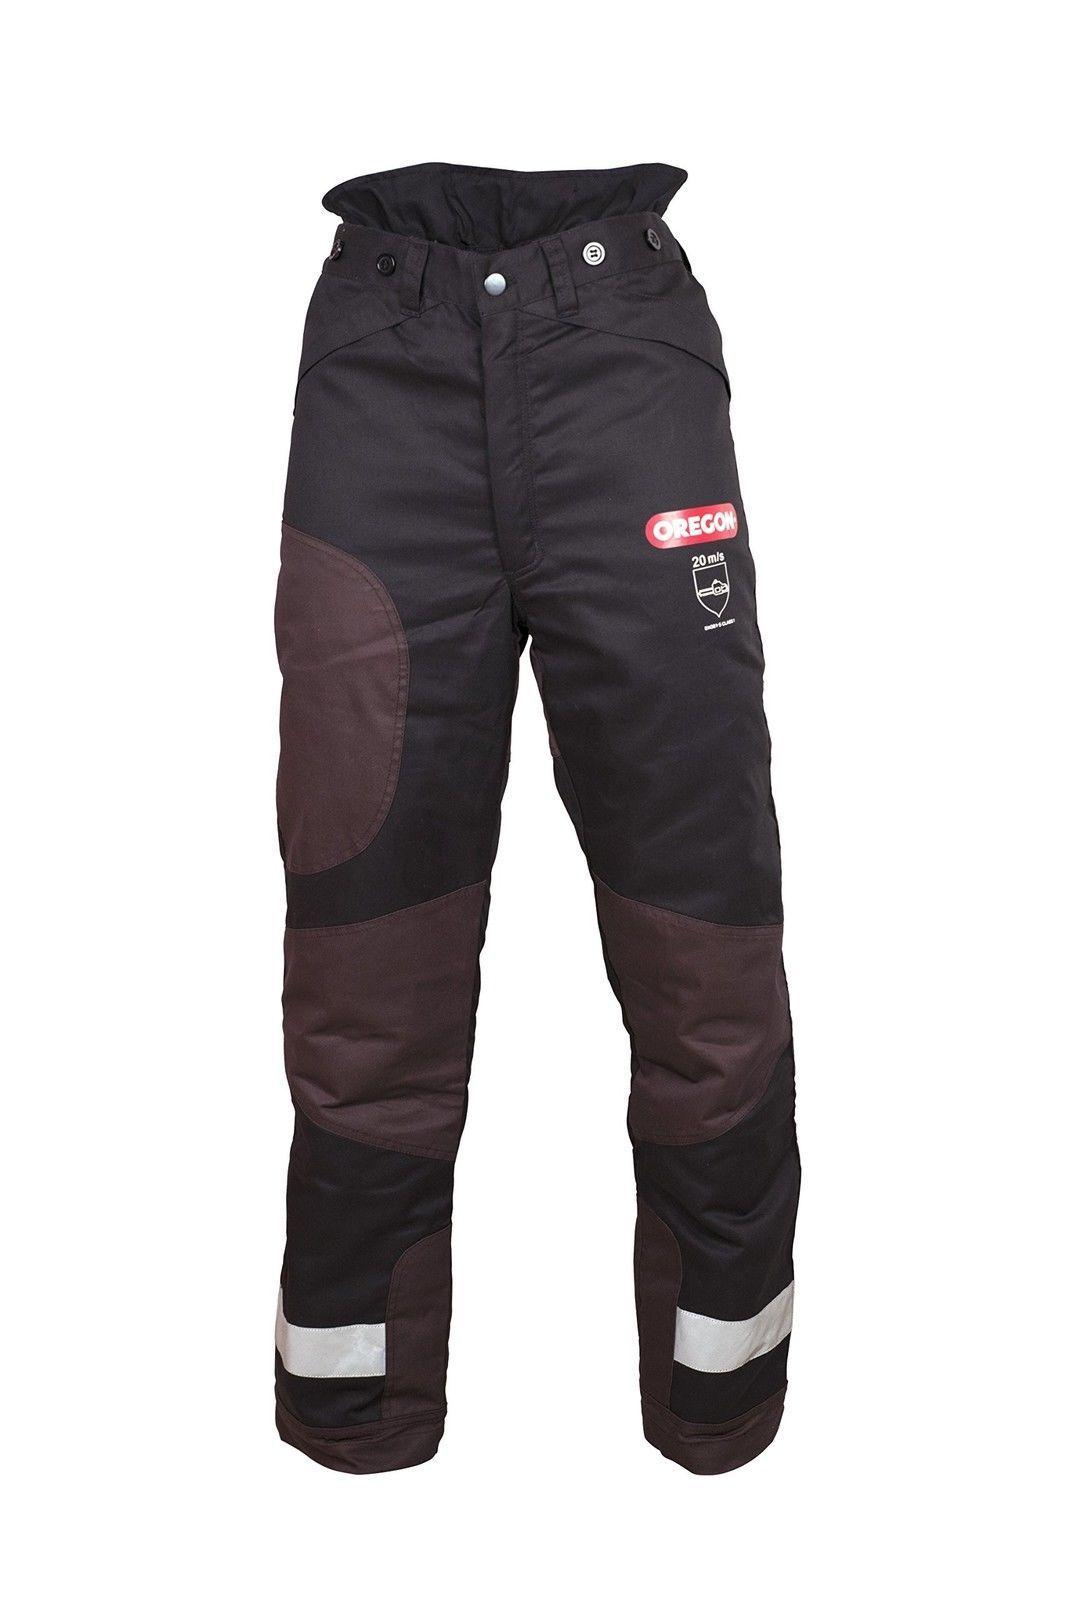 Talla XL pantalones ligeros para motosierra//trabajo//exterior Oregon Yukon Negros Pantalones de Protecci/ón Tipo A Clase 1 20m//s